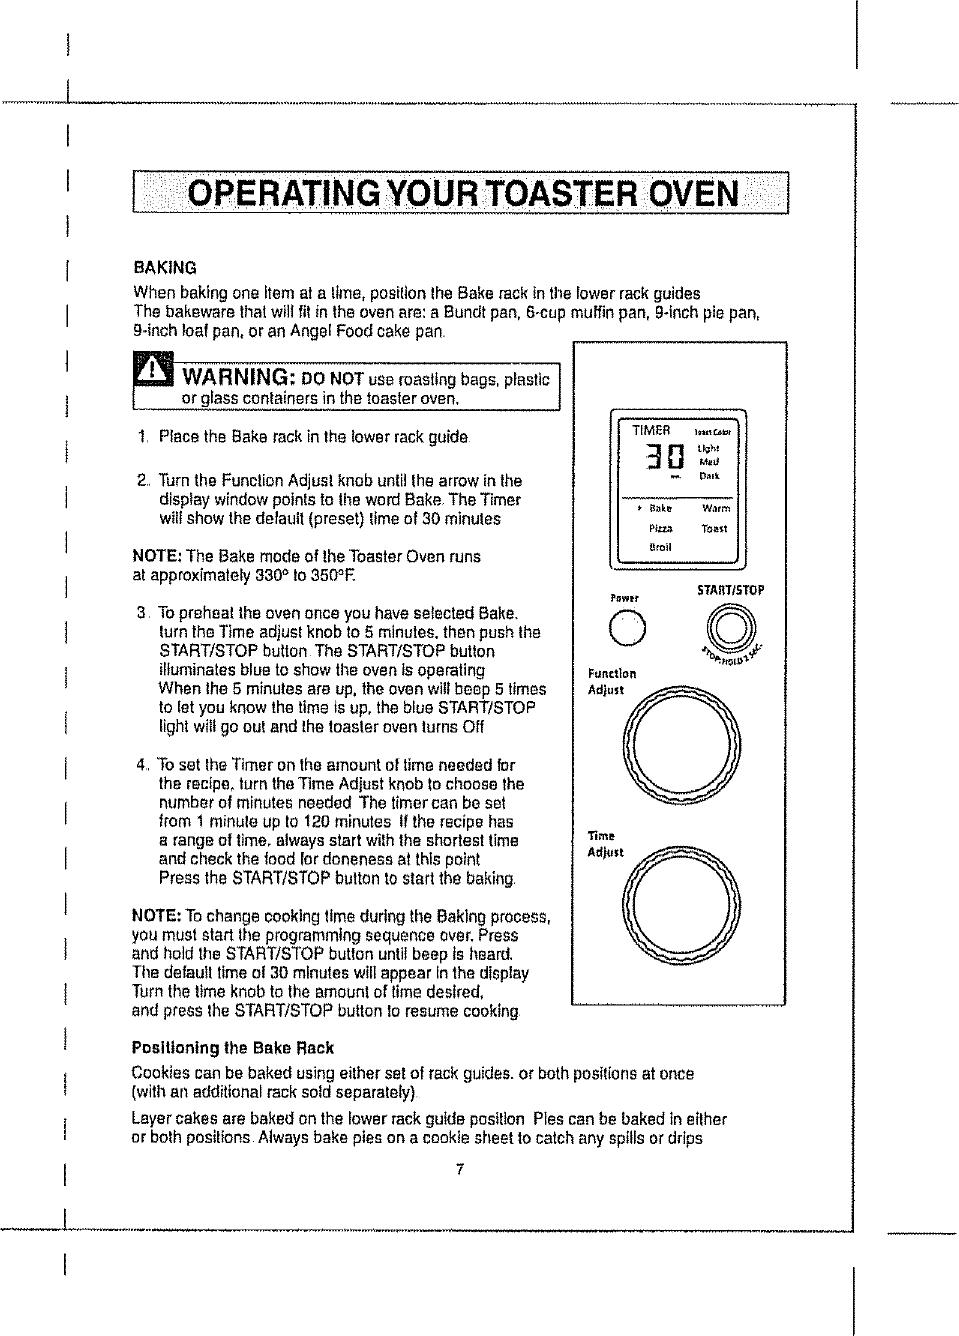 Kenmore Elite 100 90005 Users Manual